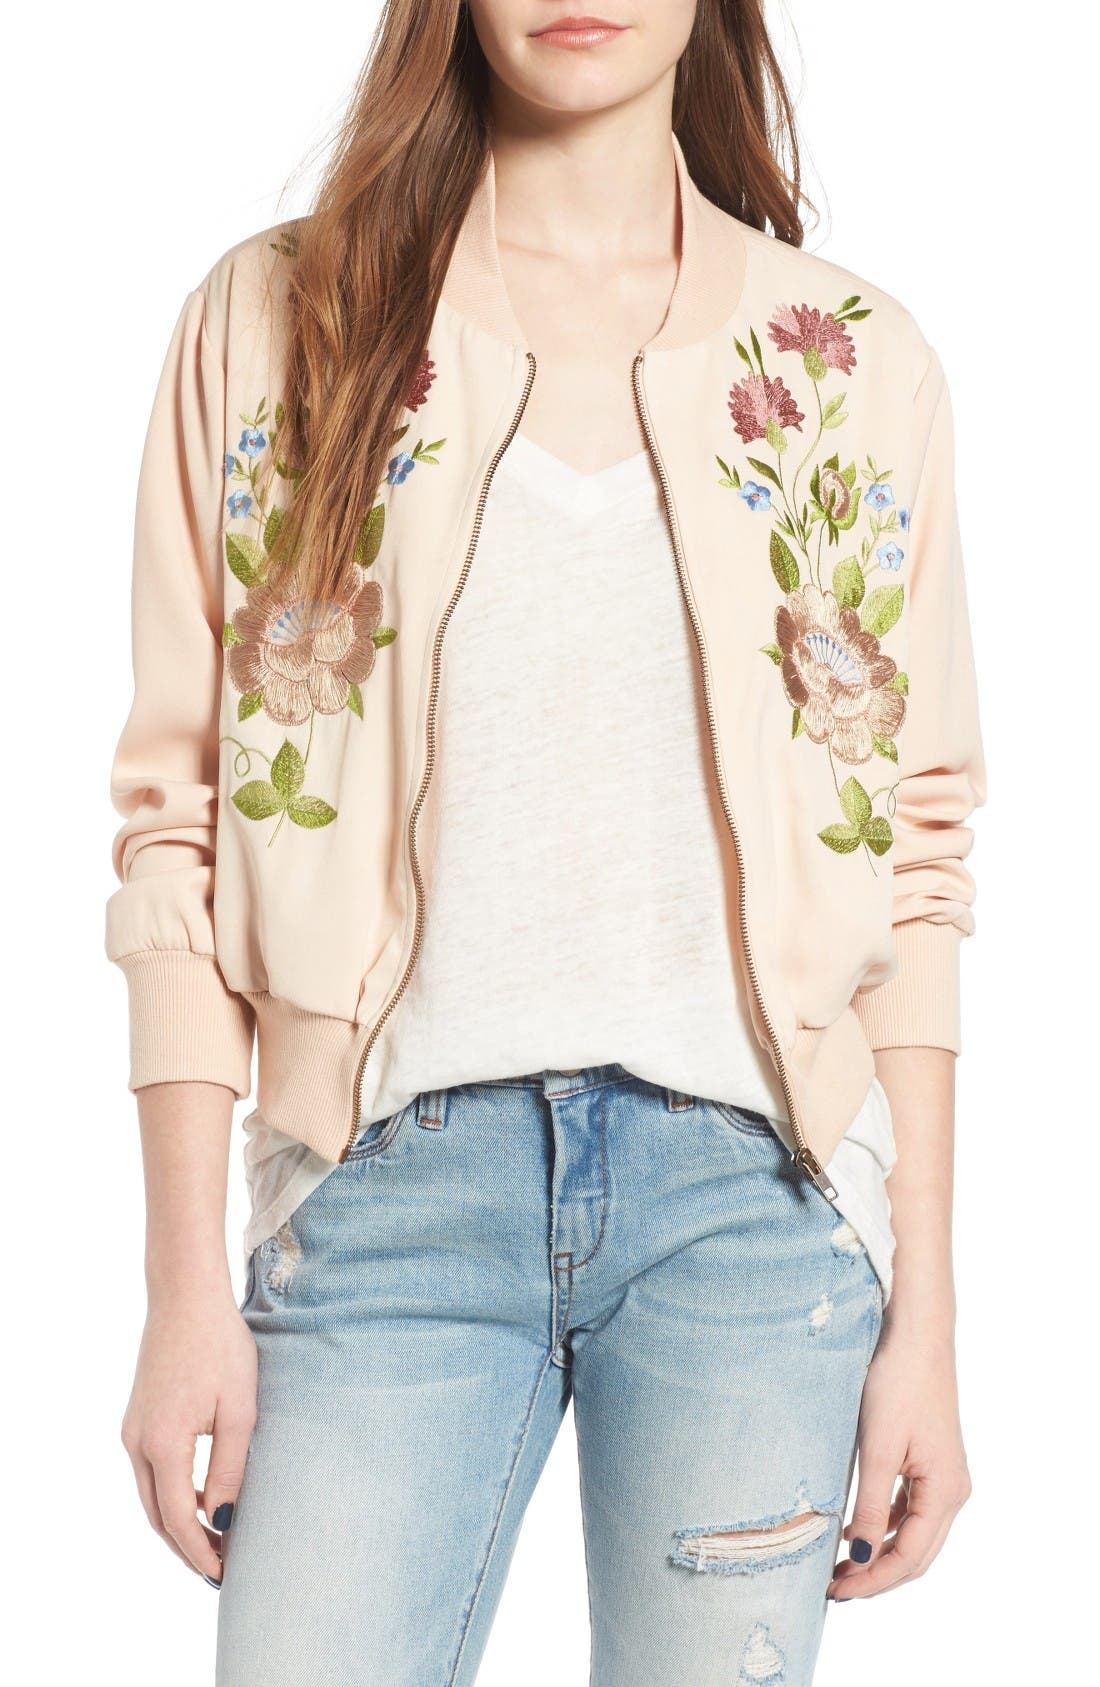 Main Image - Glamorous Floral Embroidered Bomber Jacket